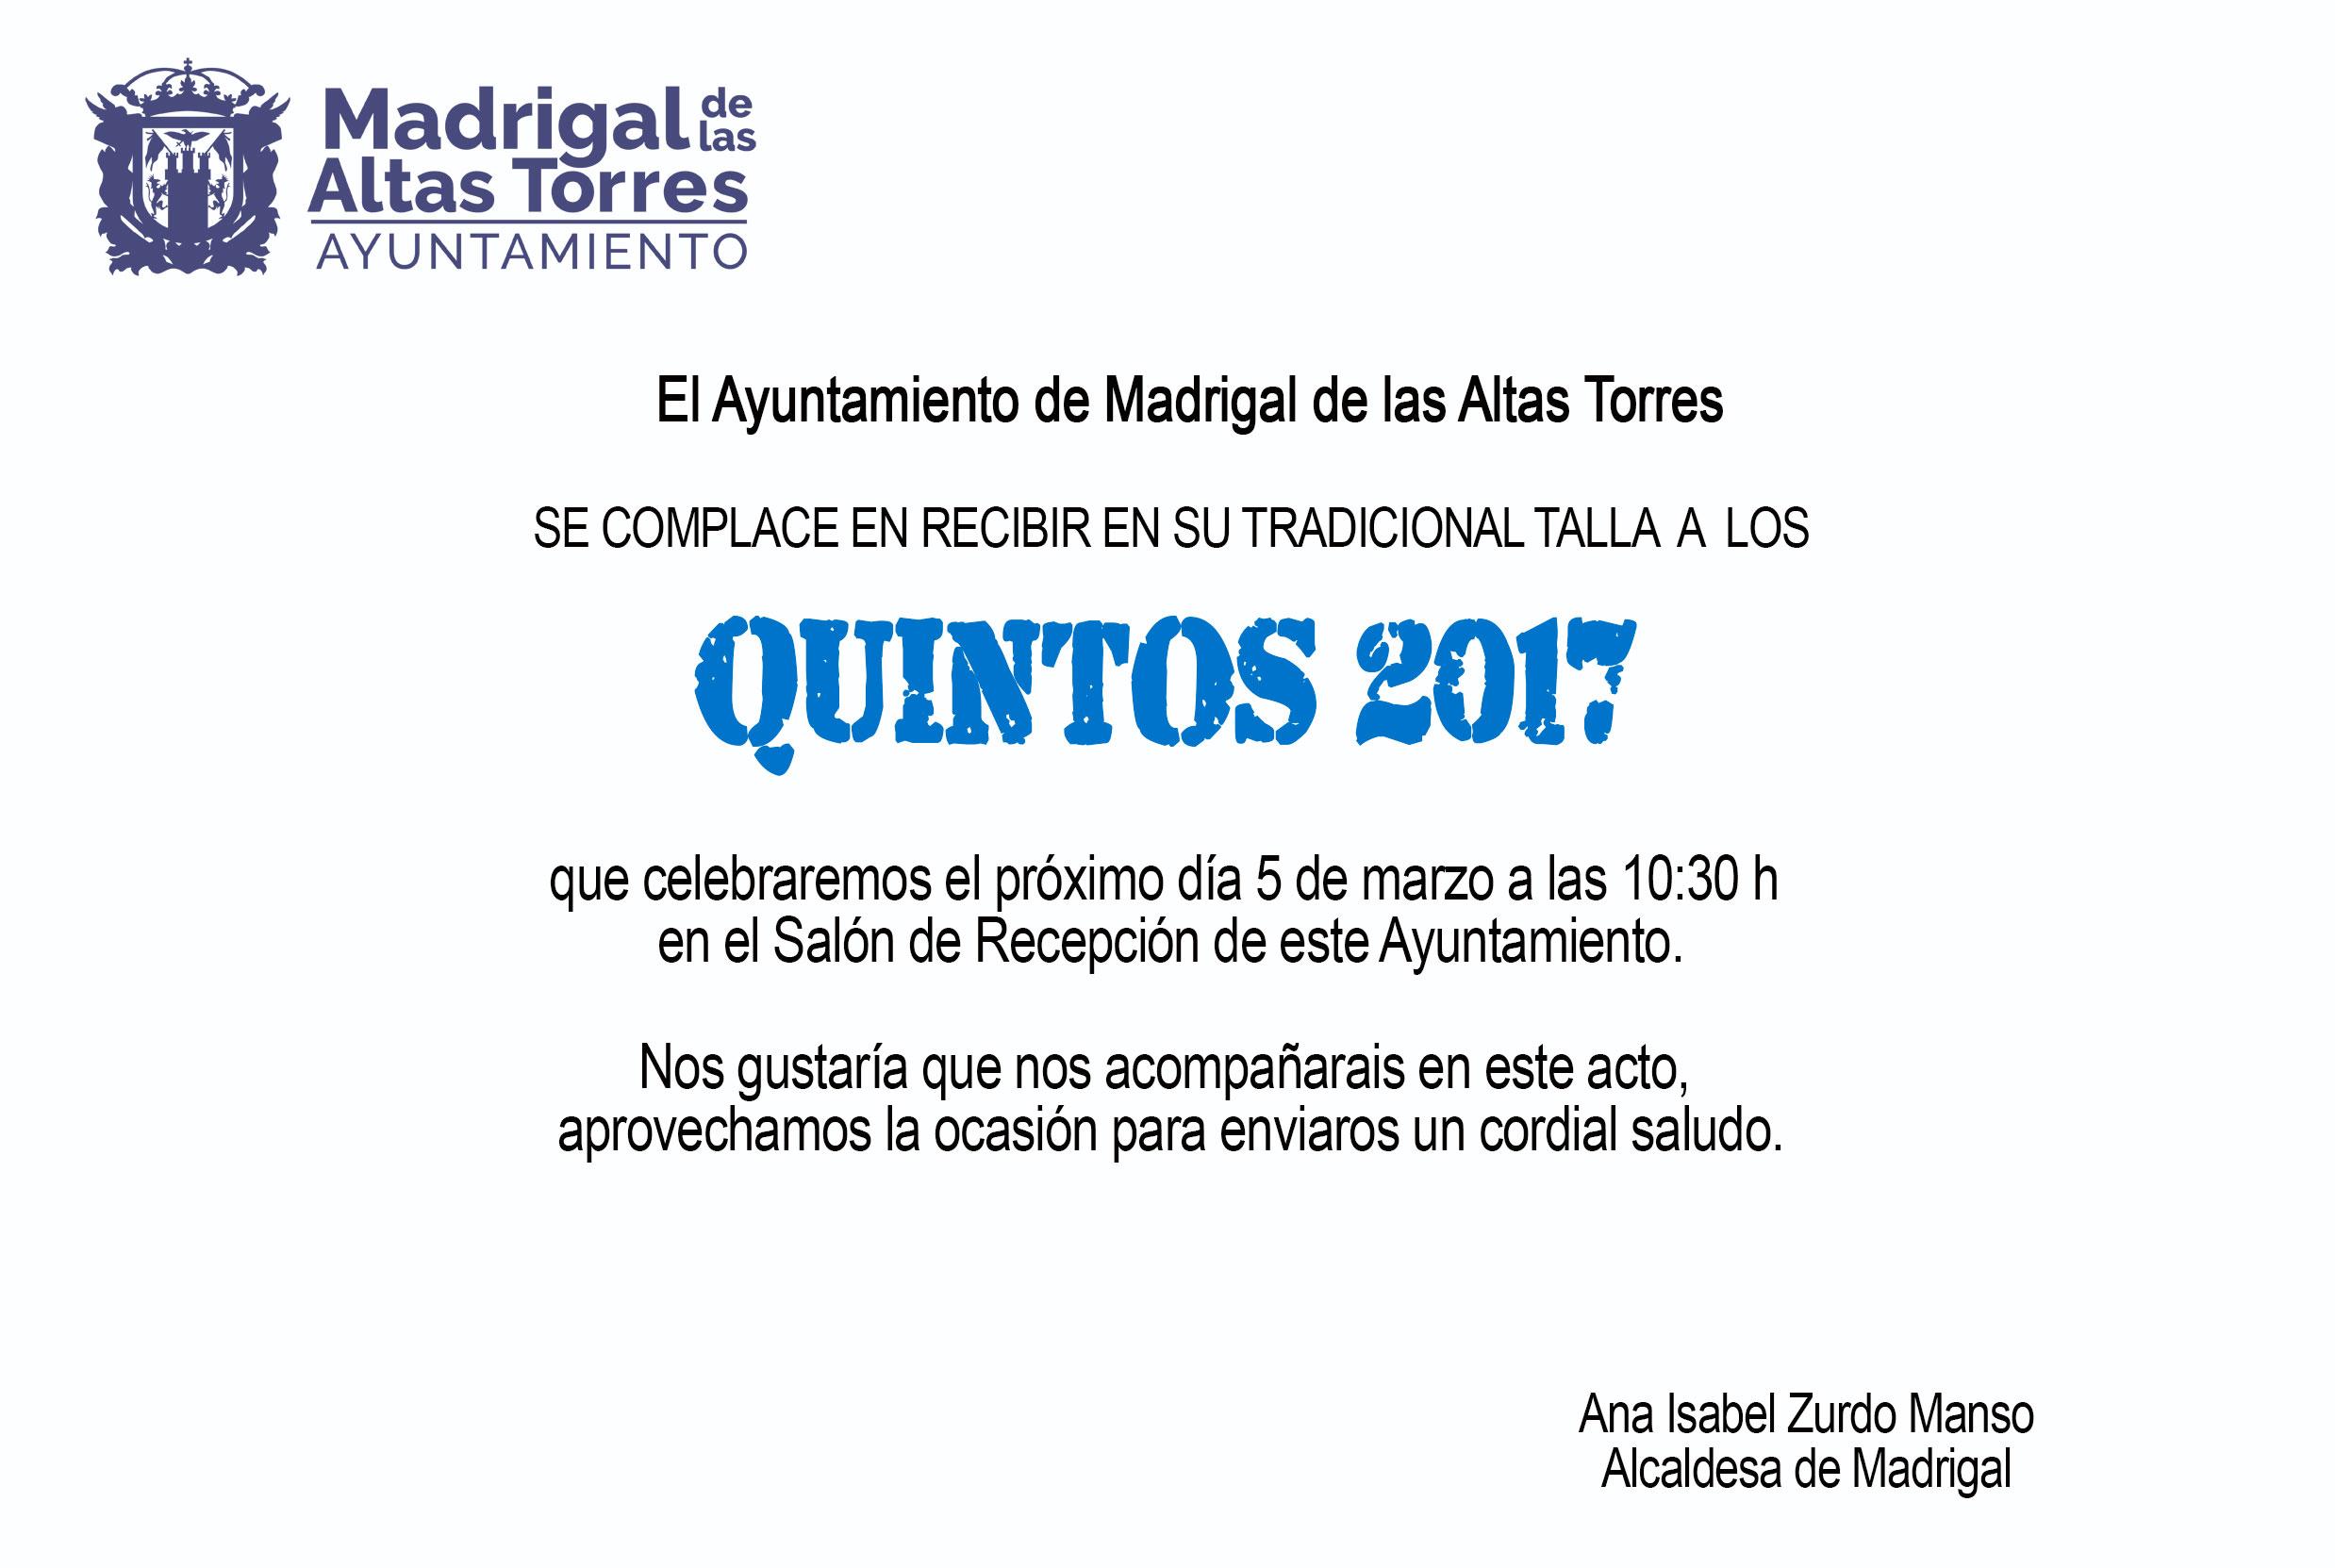 invitacionquintos2017